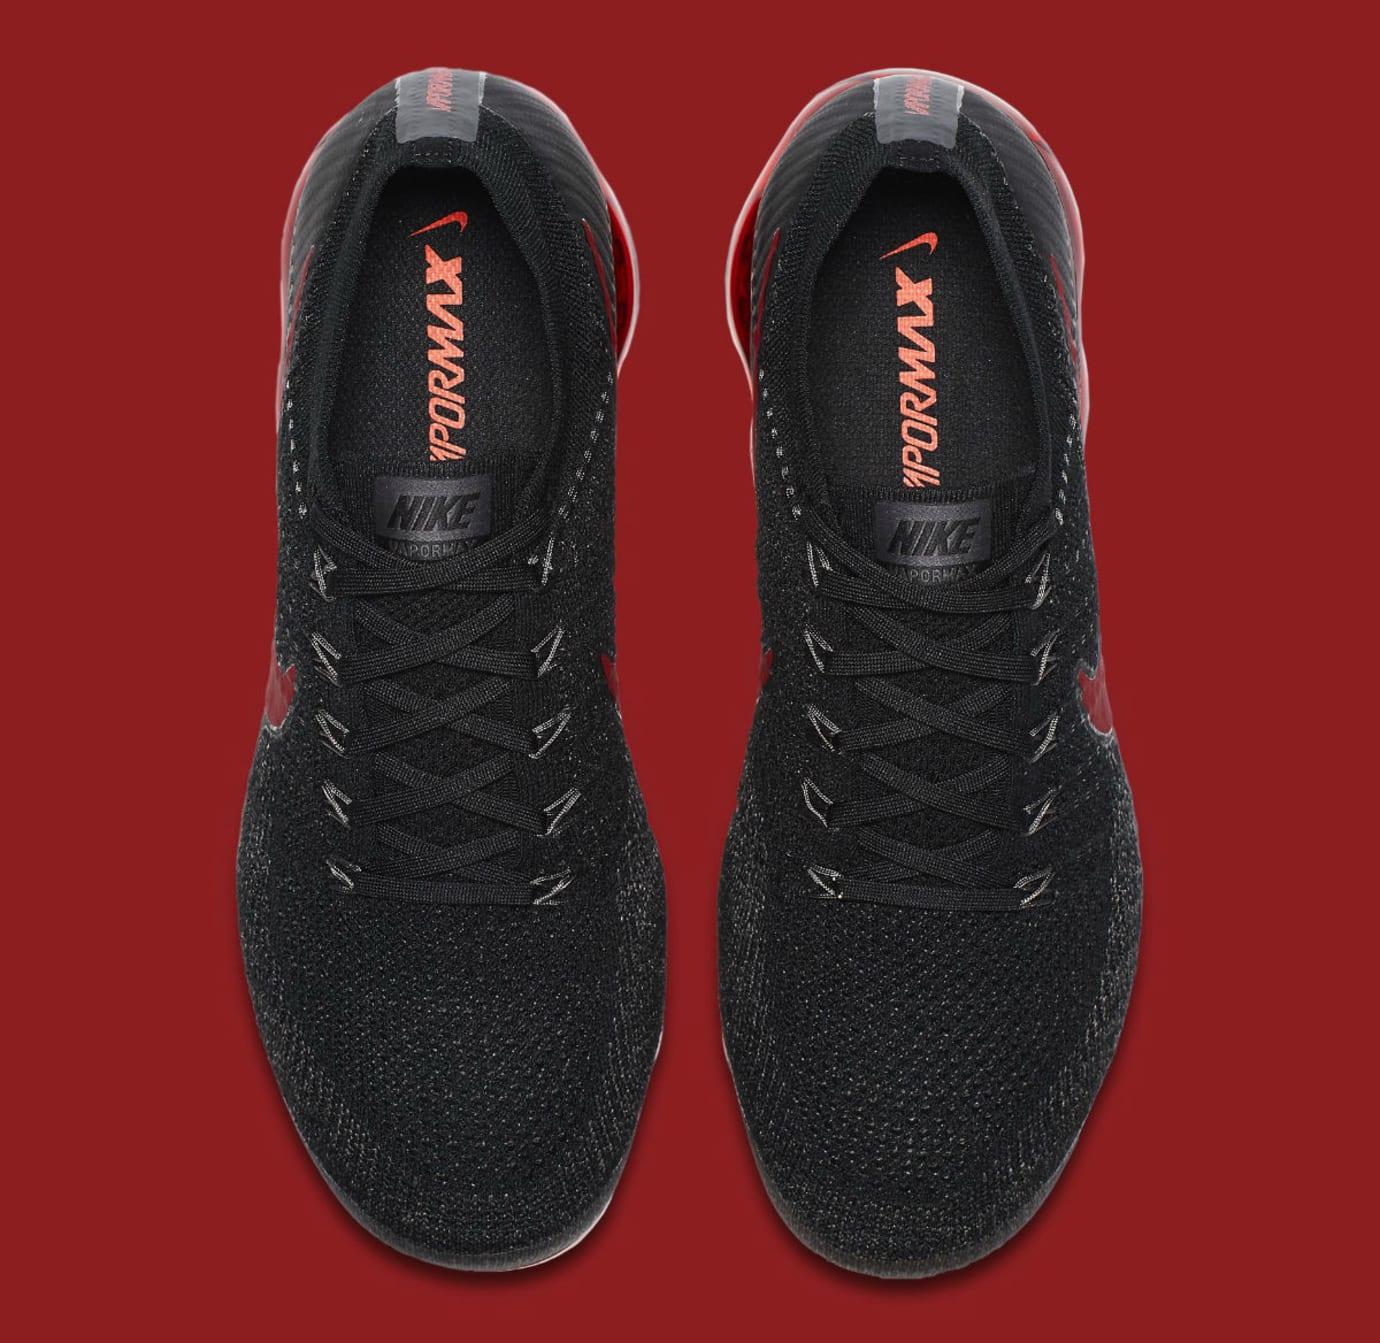 Nike Air  VaporMax Bred Release Date 849558-013 Top